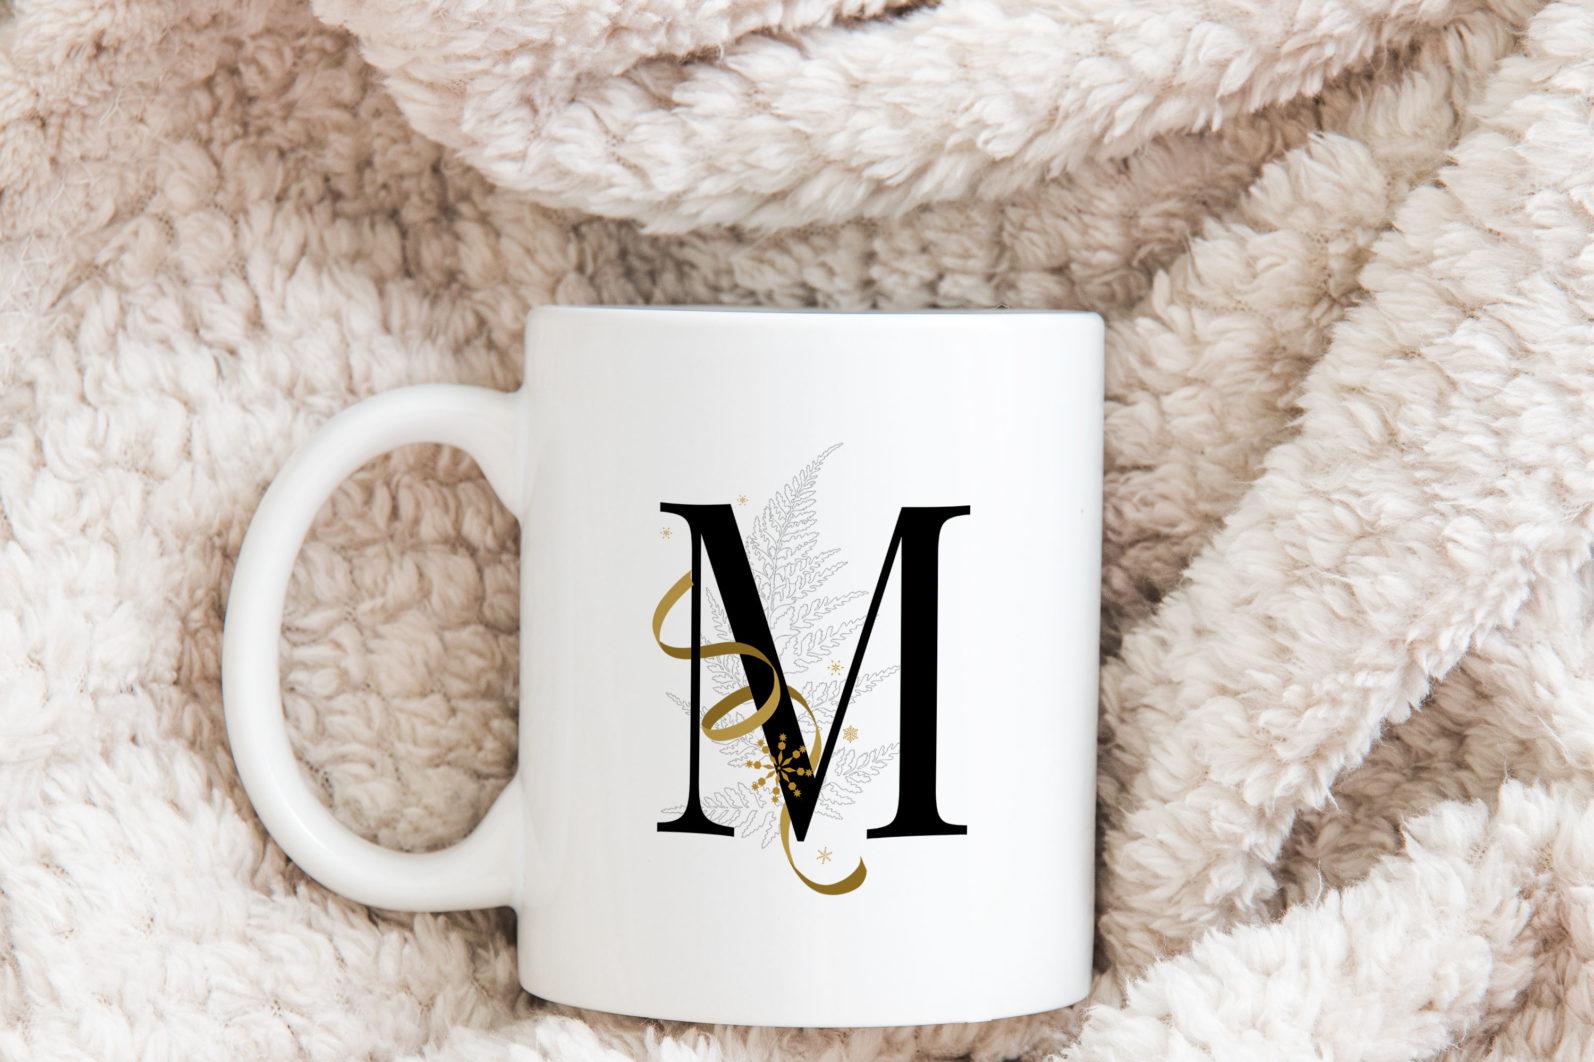 Snowflake Alphabet Letters - holiday snowflakes alphabet mug scaled -